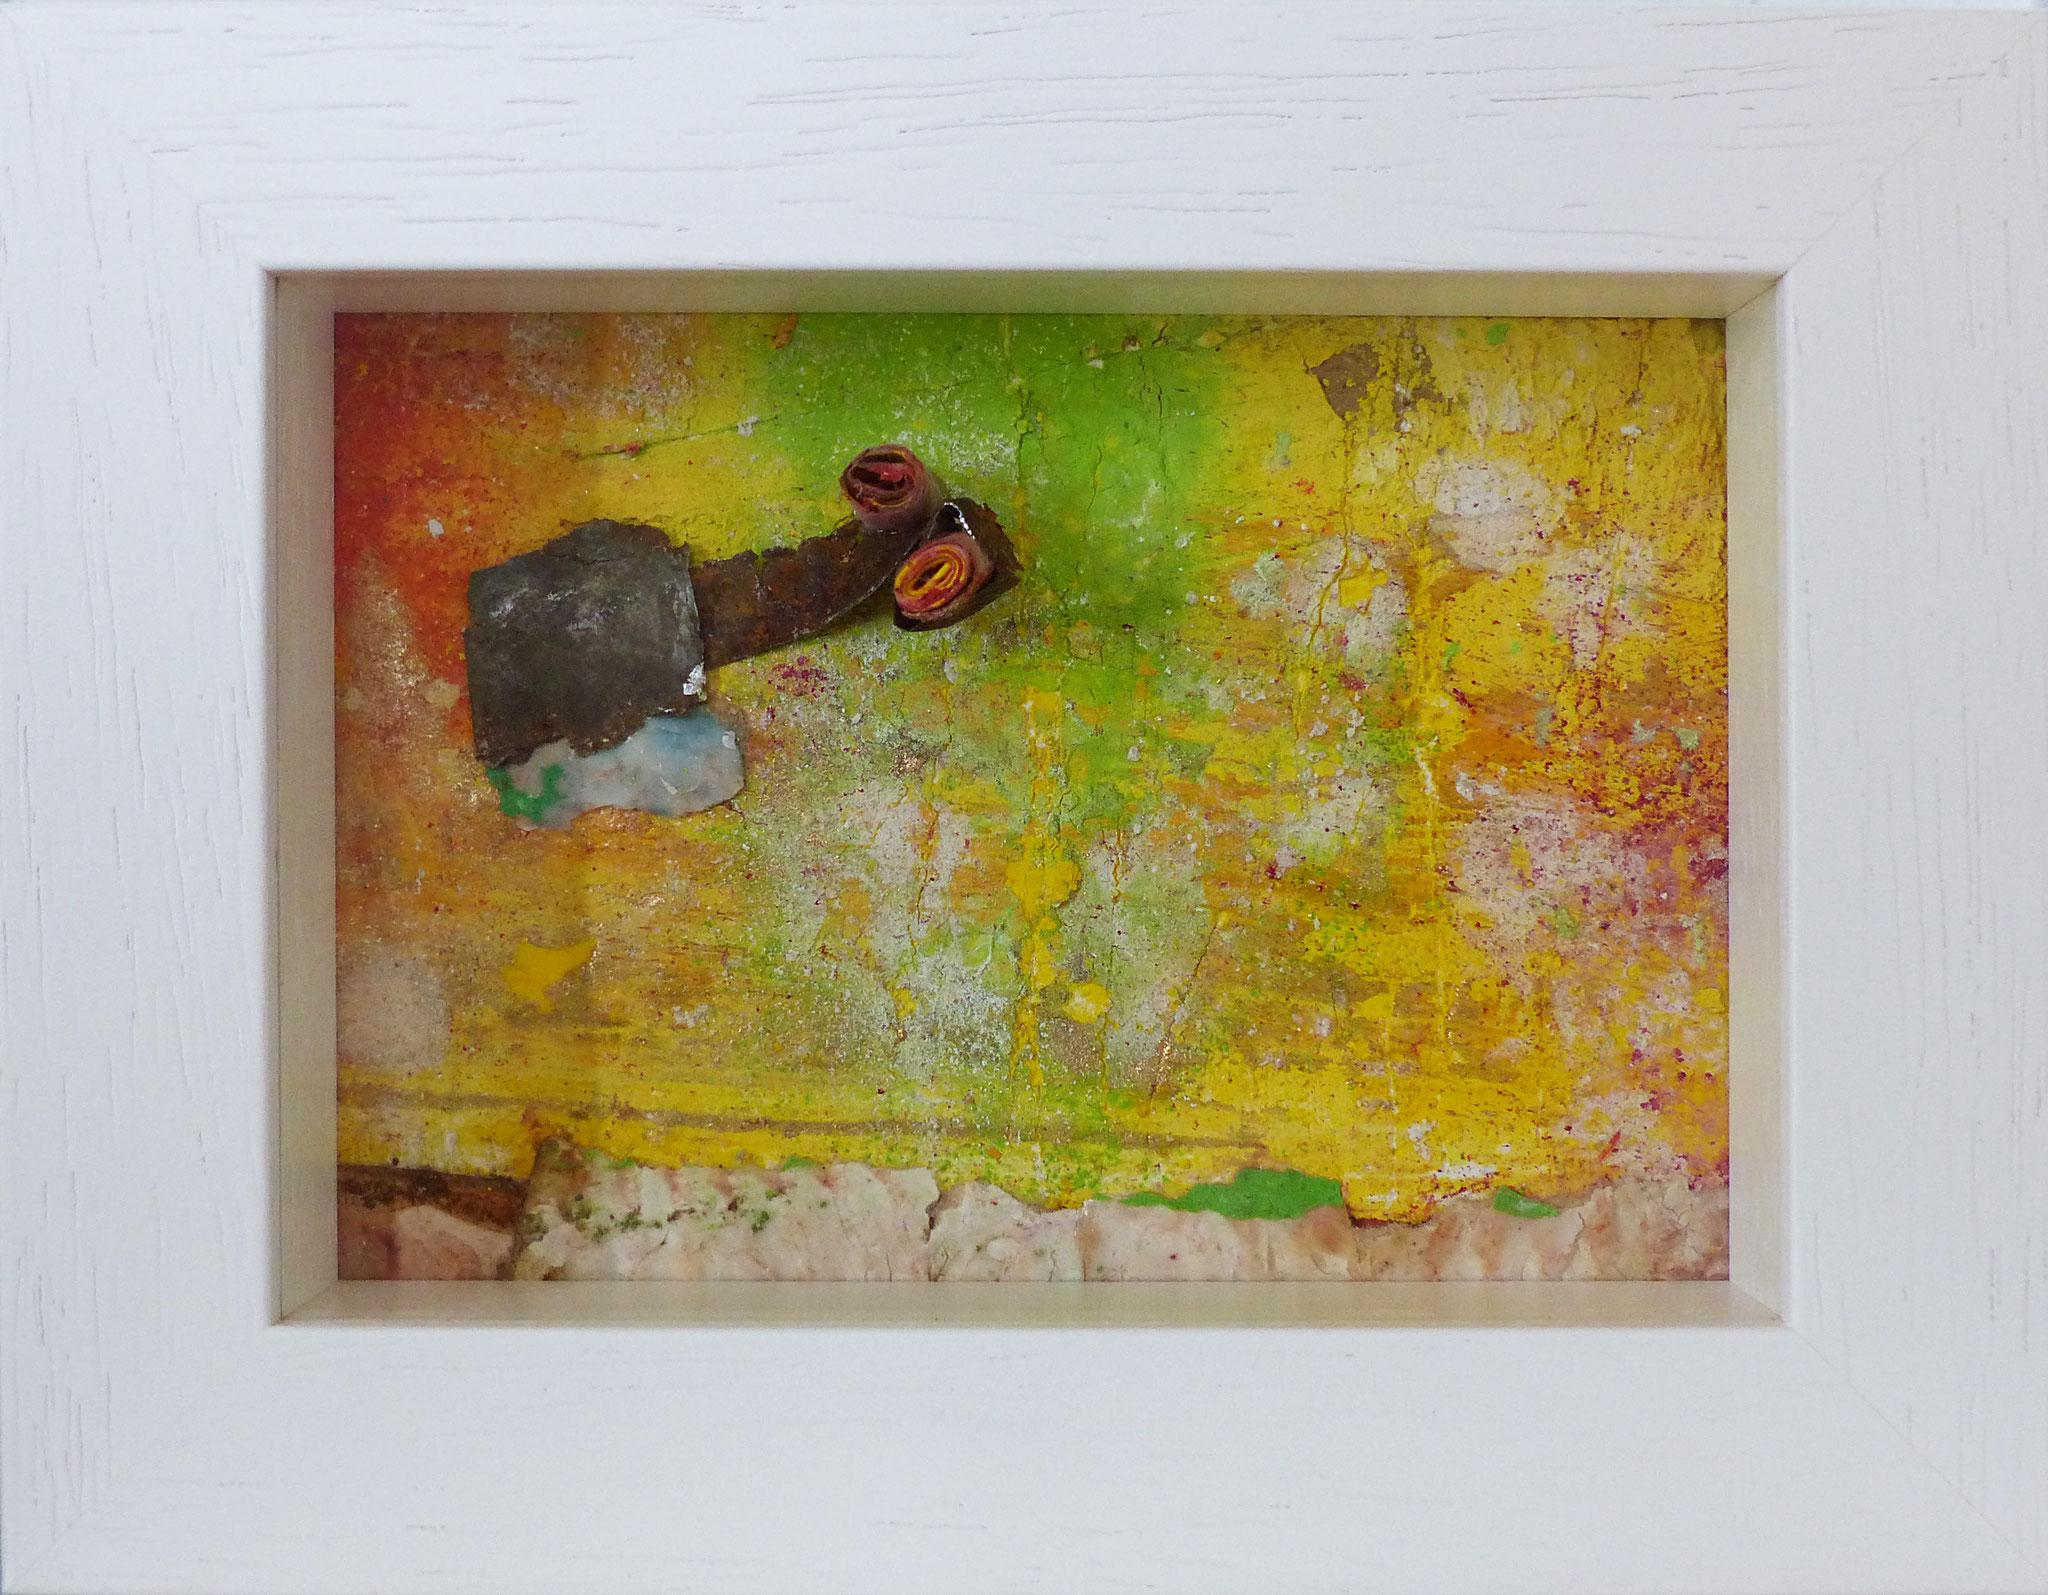 Papperlapapp 1, Acrylmischtechnik, 23 x 18 mit Rahmen, 2018,  verkauft